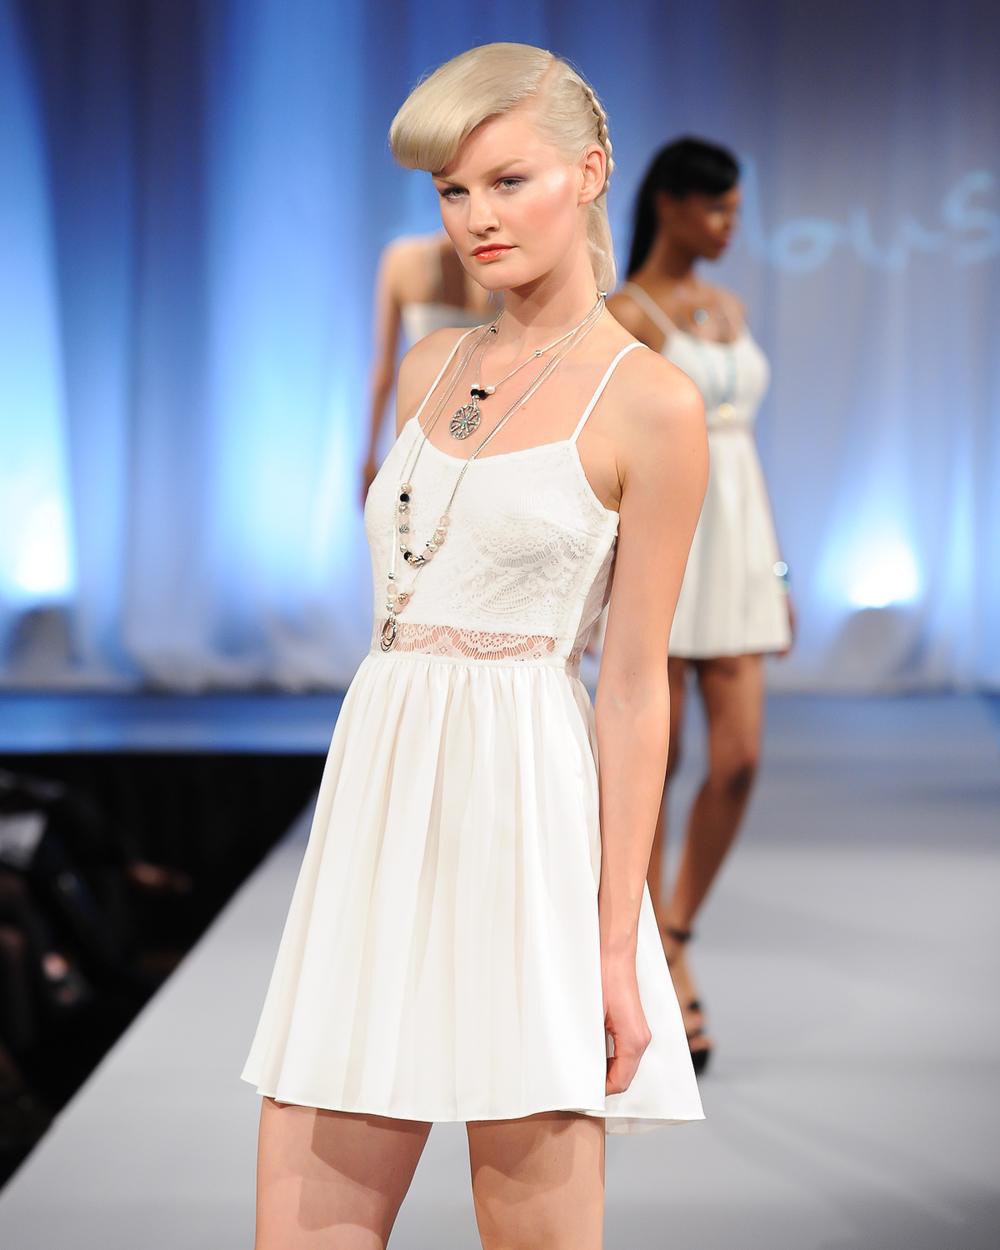 bristol-fashion-photographer-7.jpg